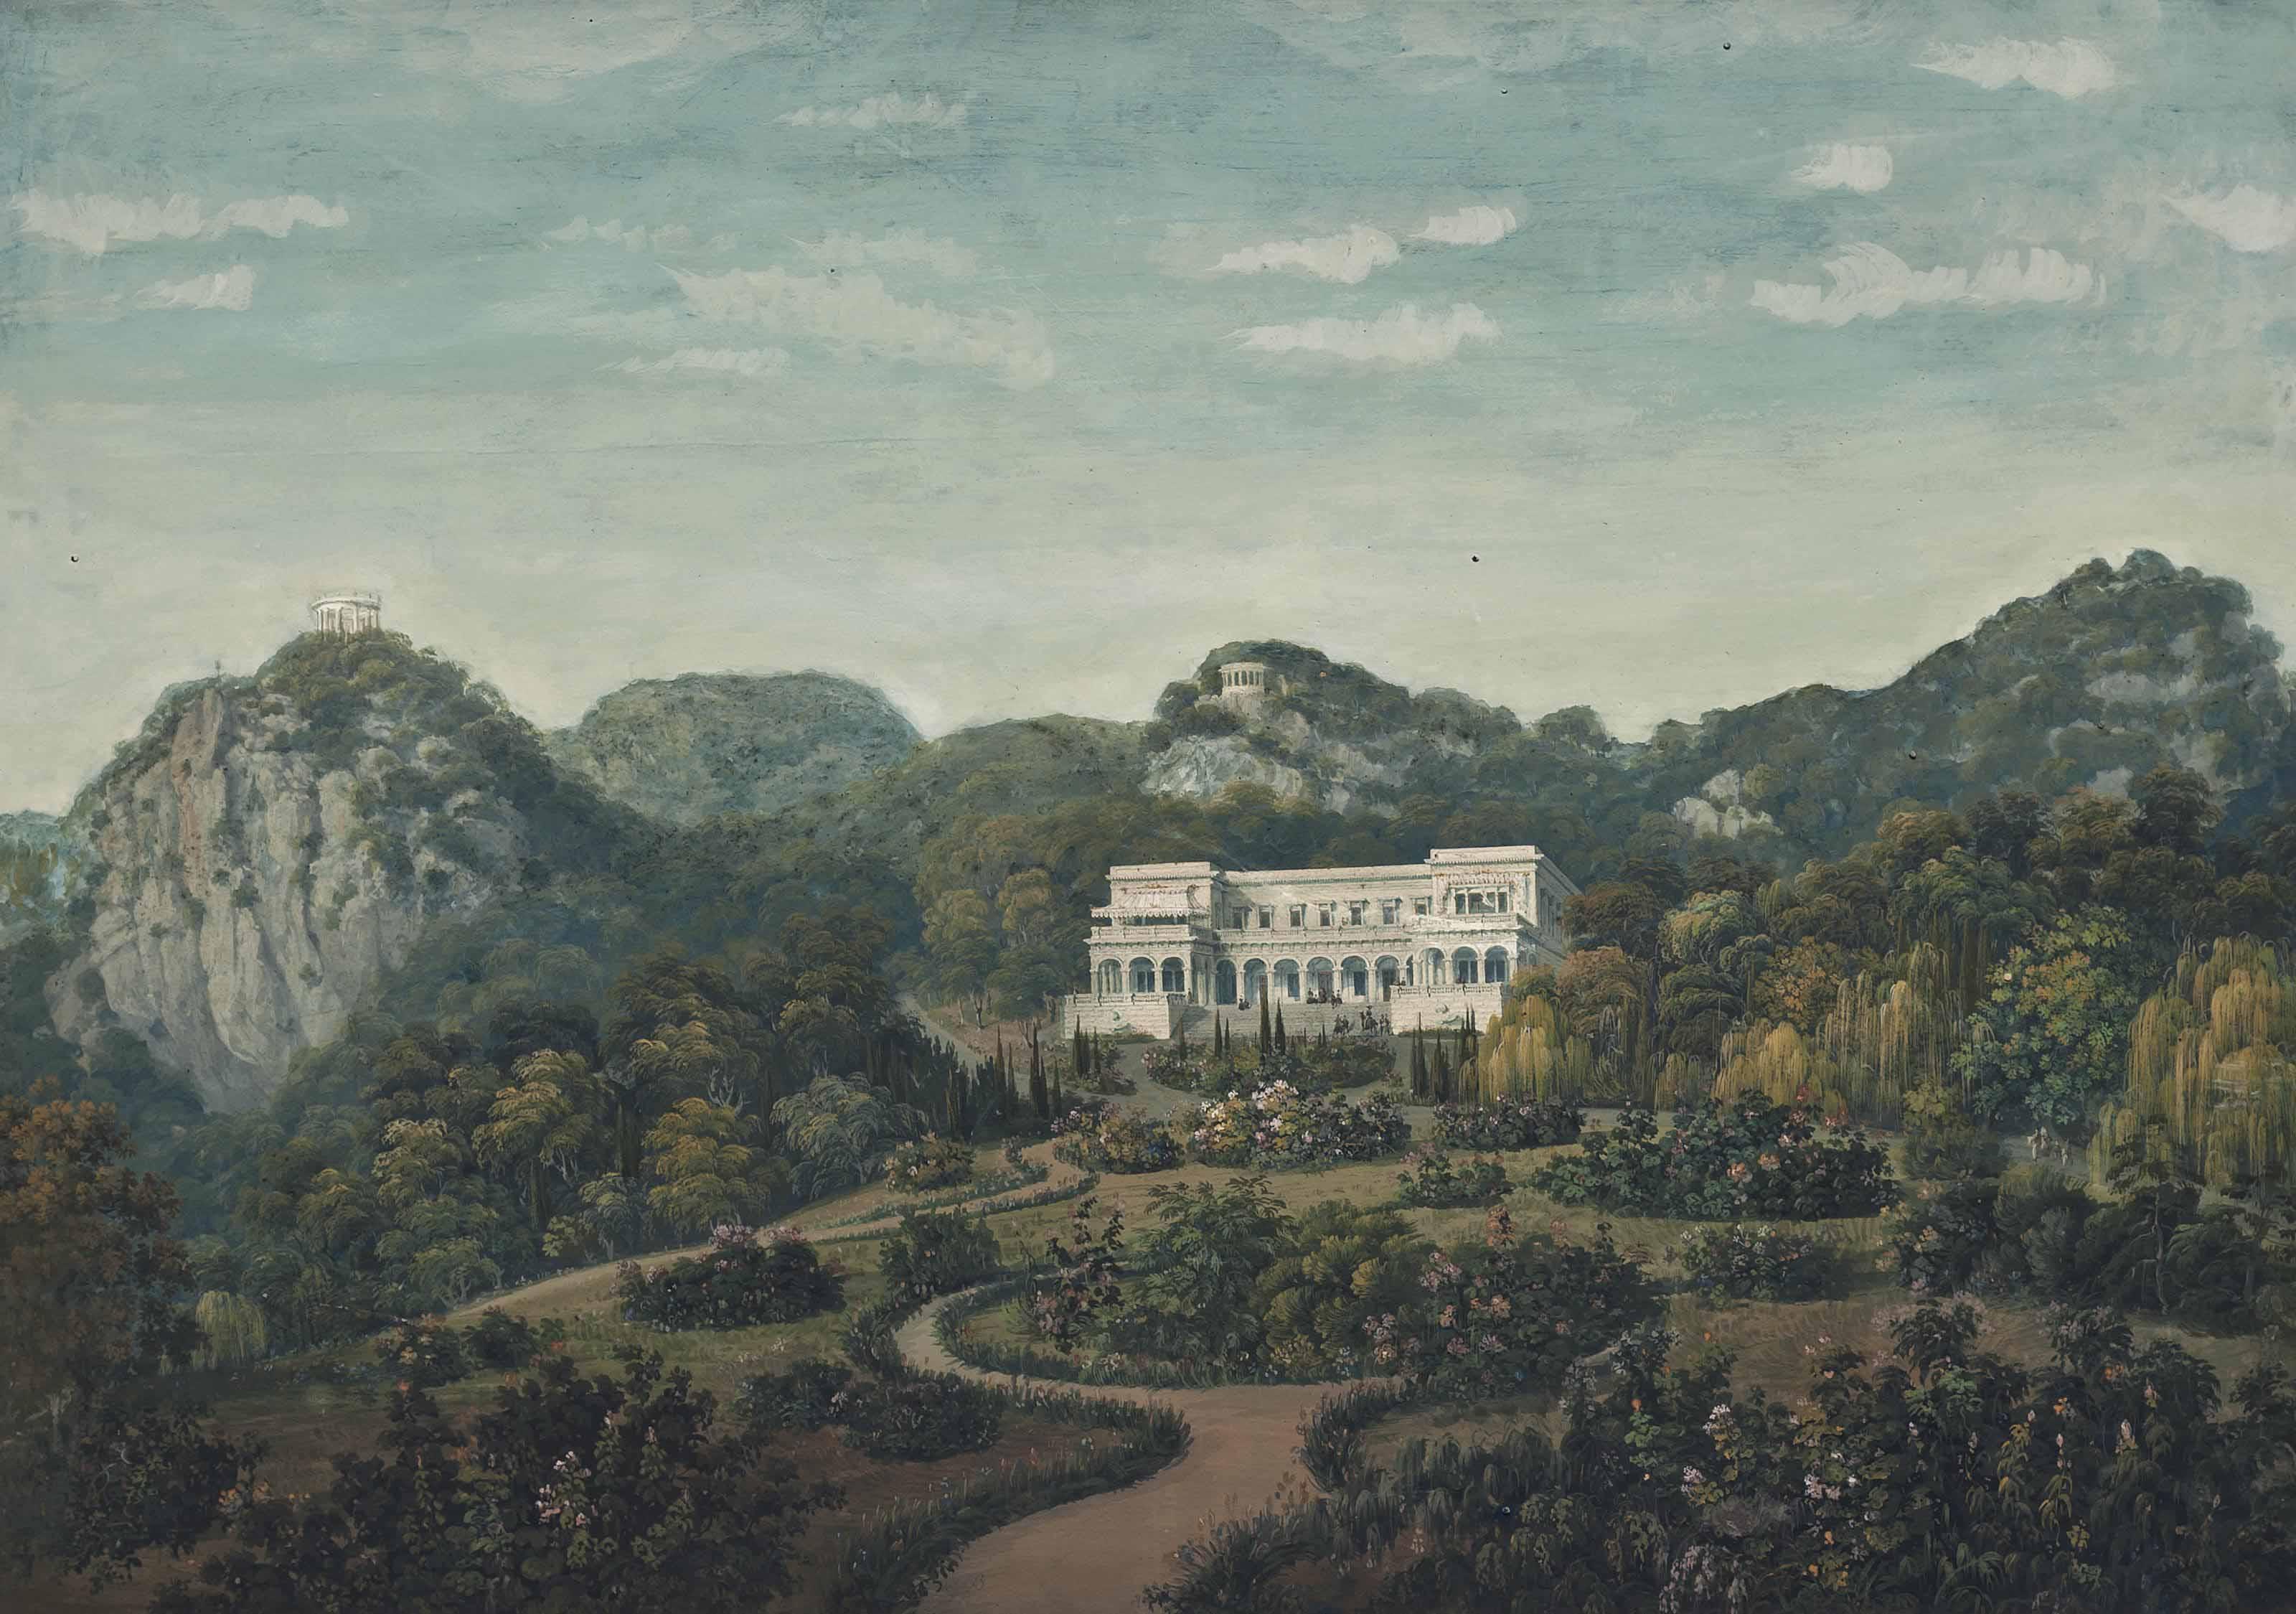 An aristocratic estate